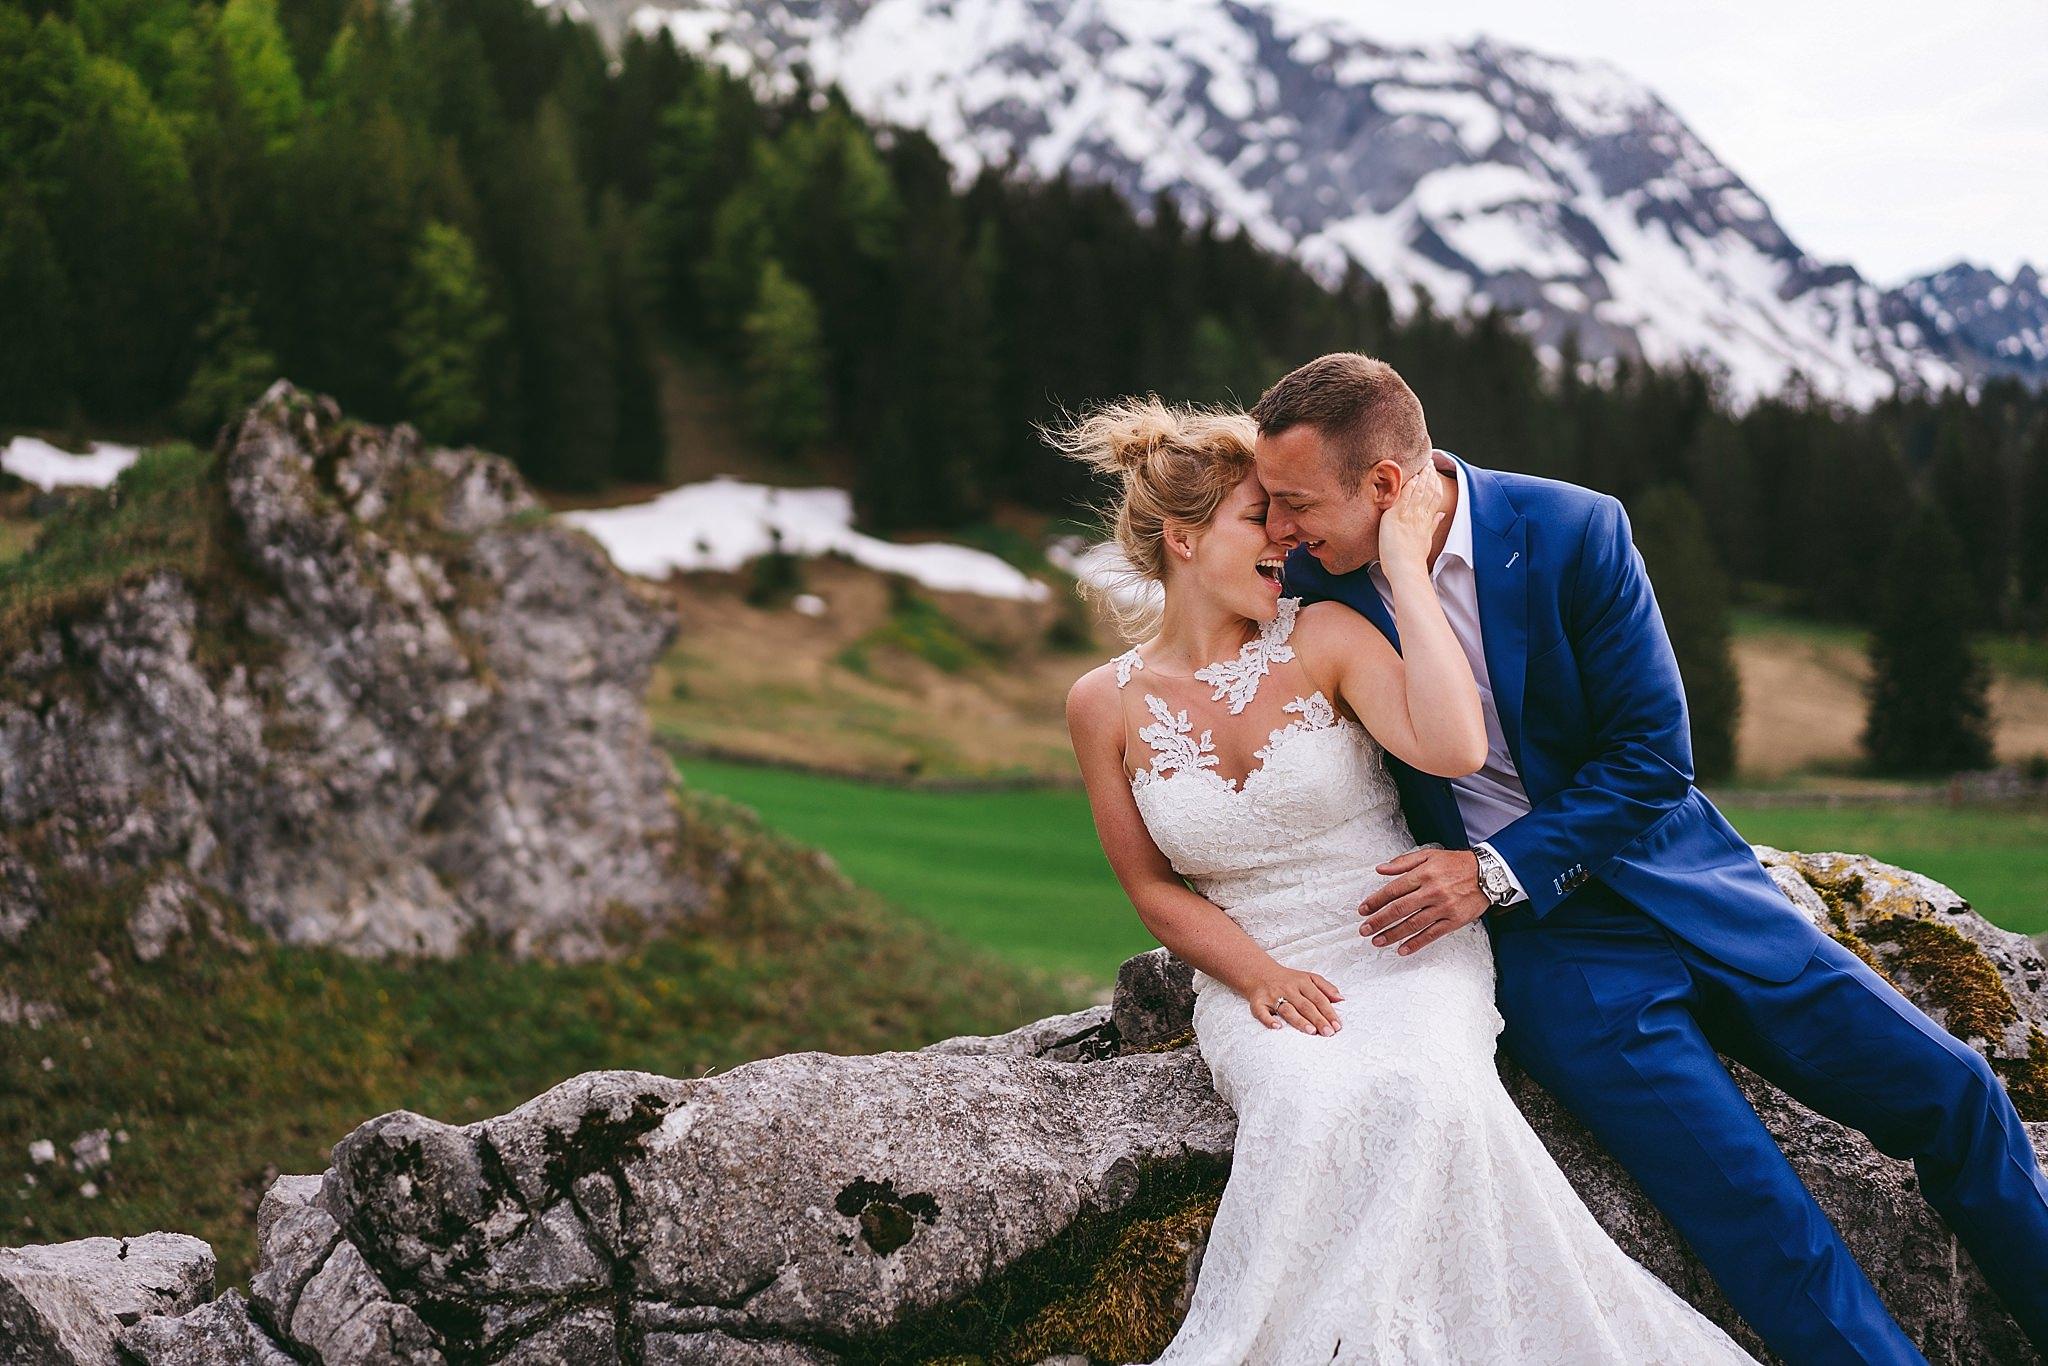 aga-tomaszek-wedding-photographer-cardiff-2016_1037